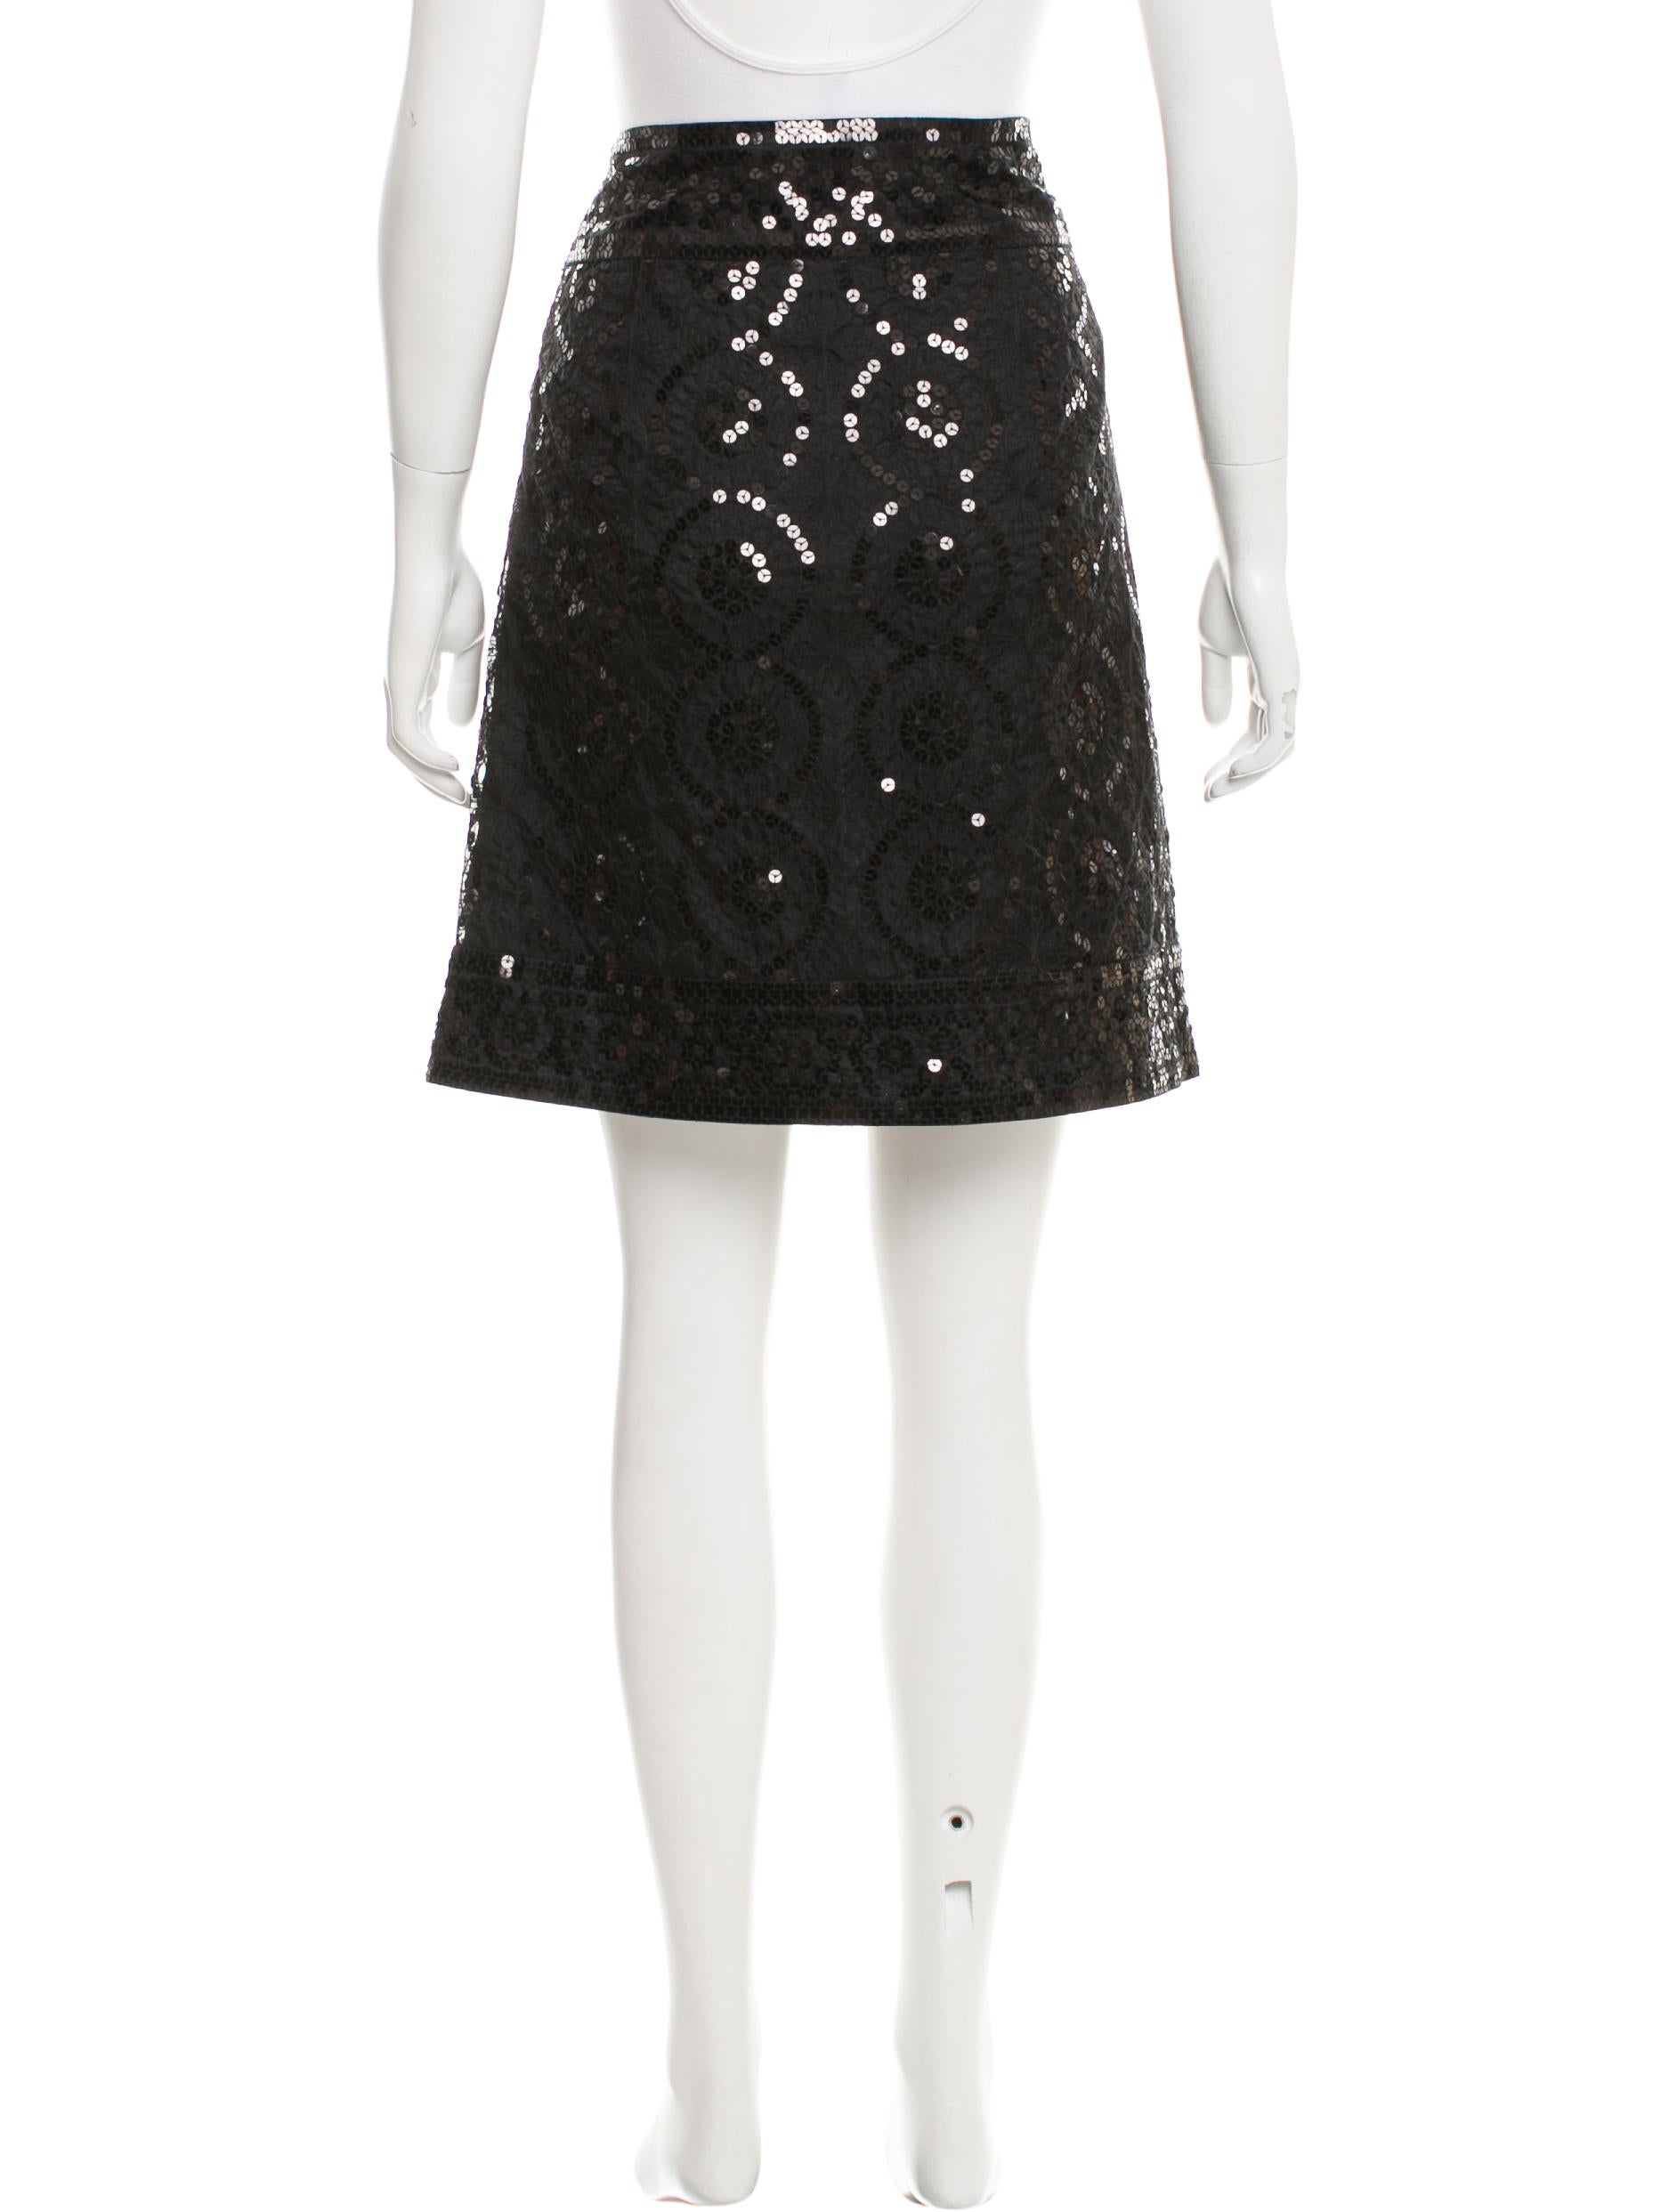 burch sequin embellished knee length skirt clothing